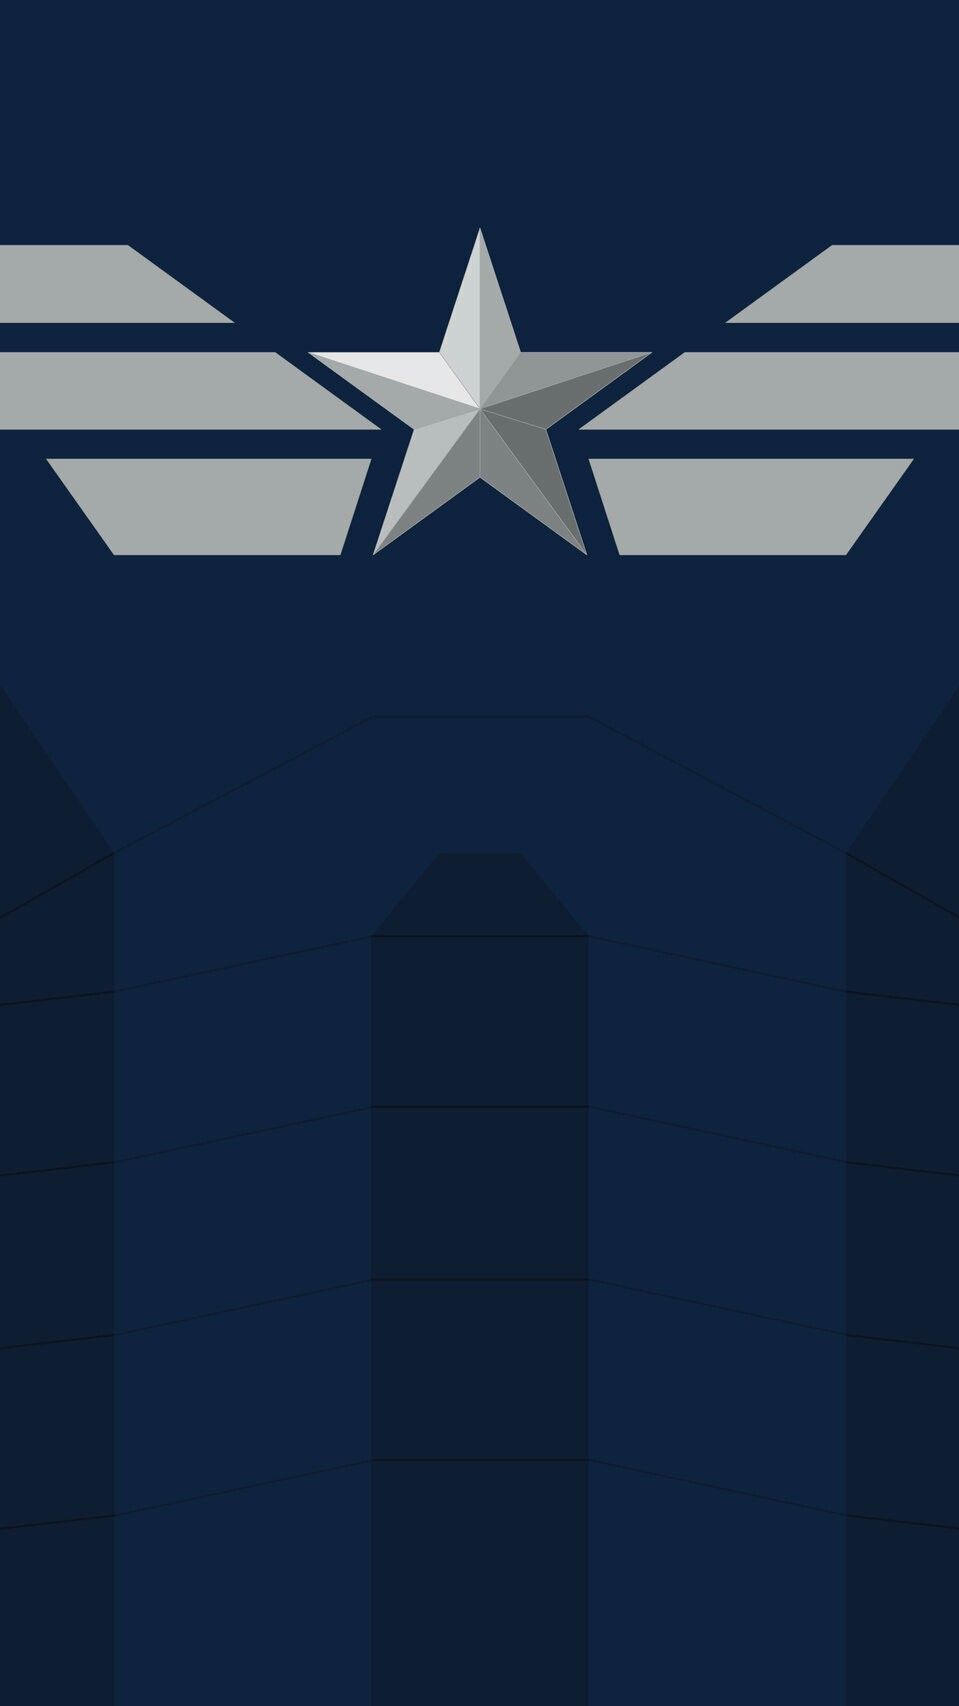 Captain America Symbol iPhone Wallpaper